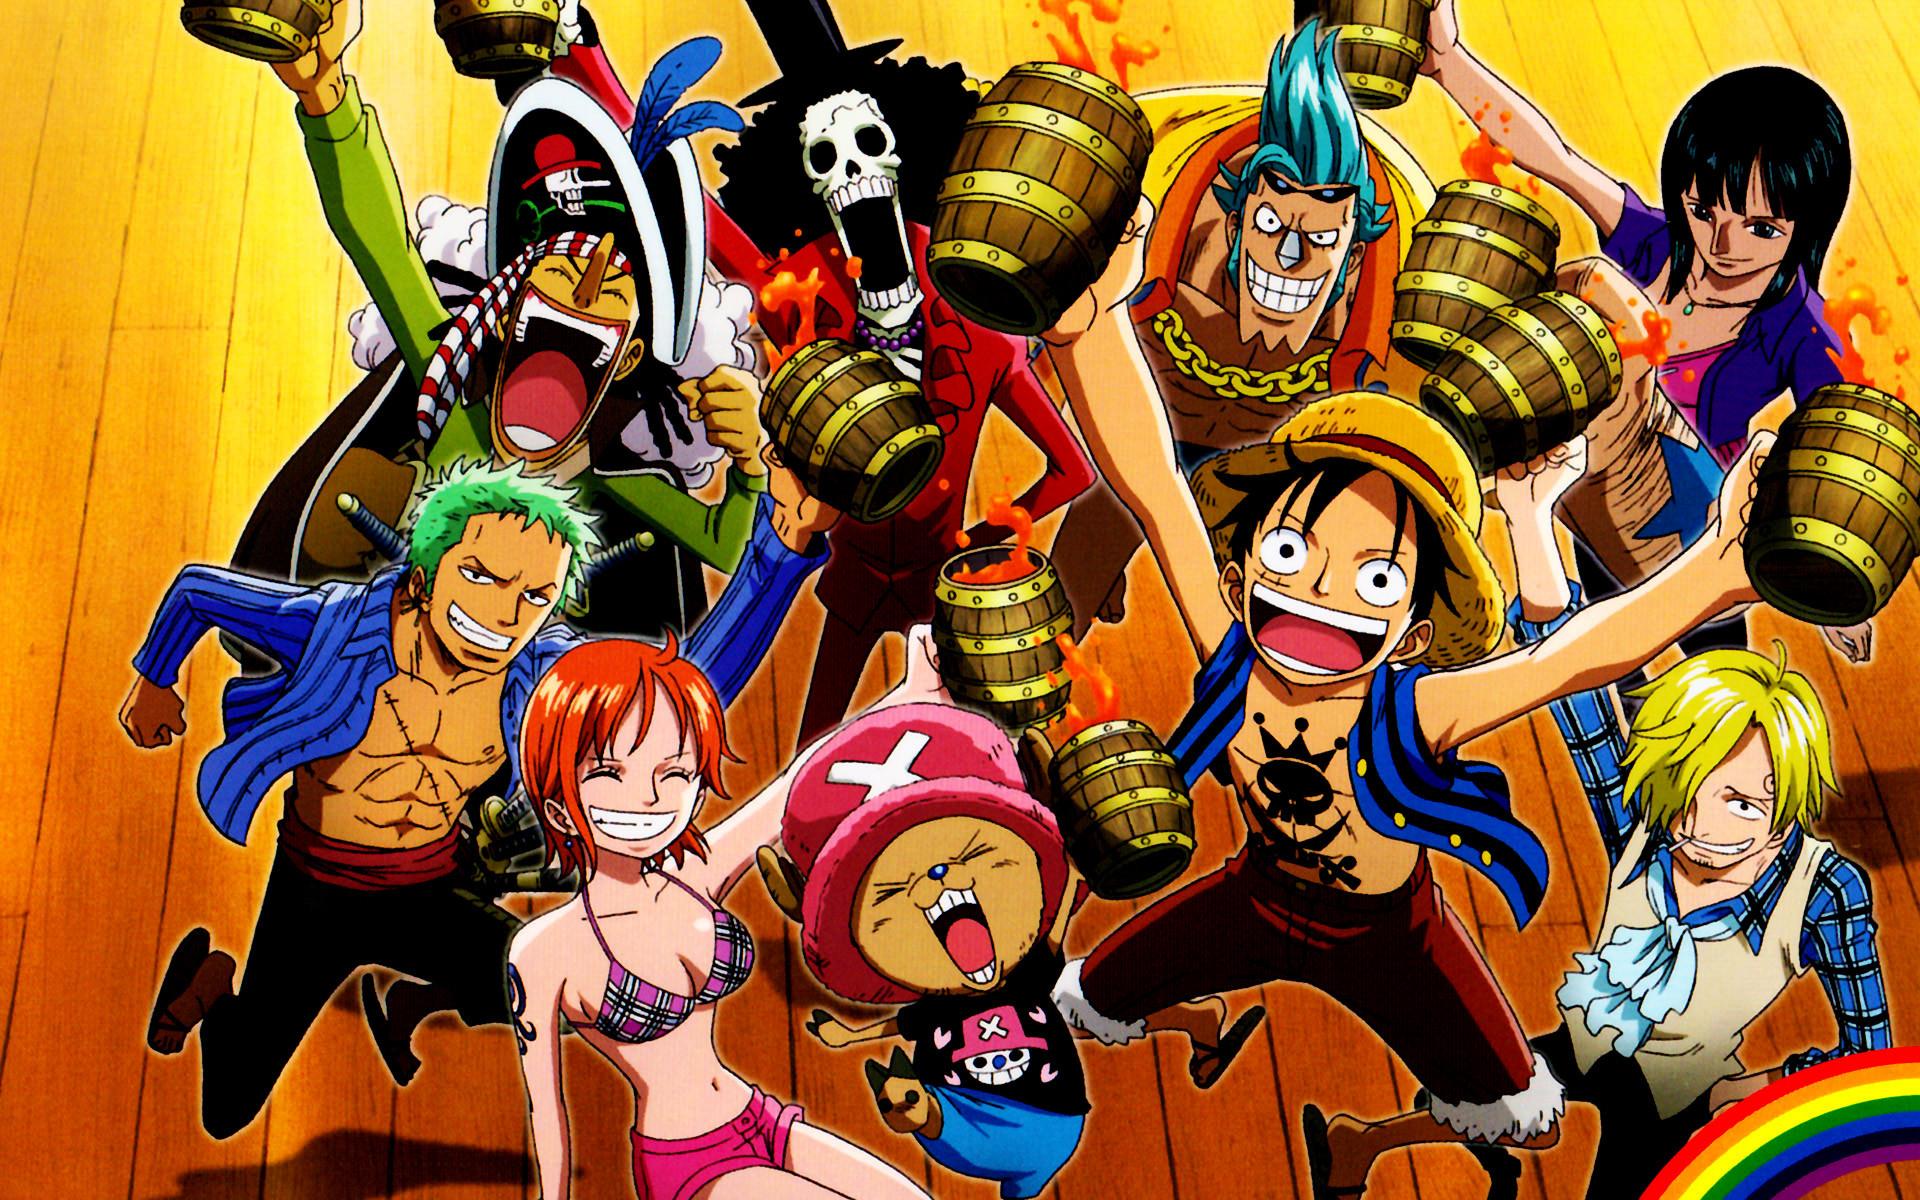 Top 30 addicting anime Top 30 One Piece haruhichan.com series